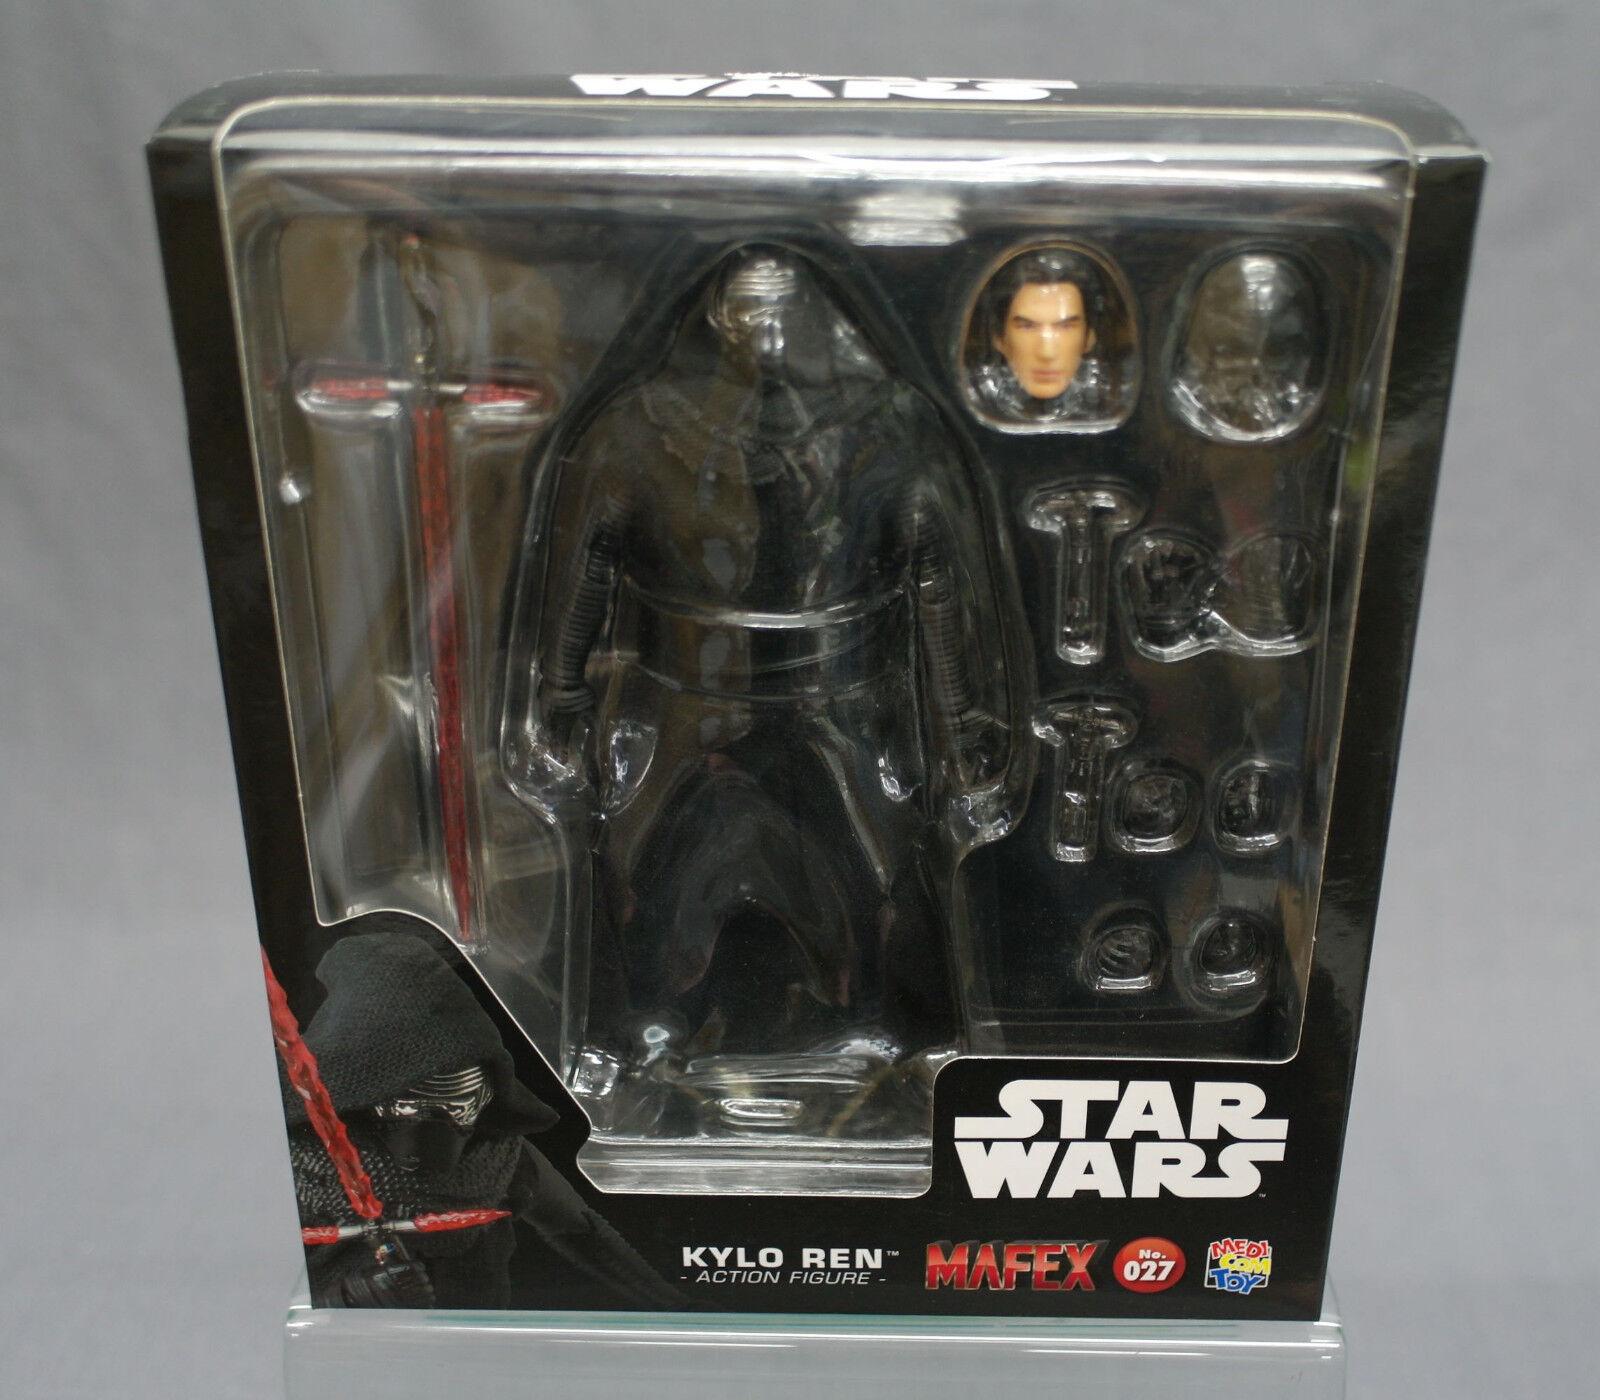 MAFEX No.027 estrella guerras The Force Awakens KYLO REN Medicom giocattolo nuovo JAPAN nuovo